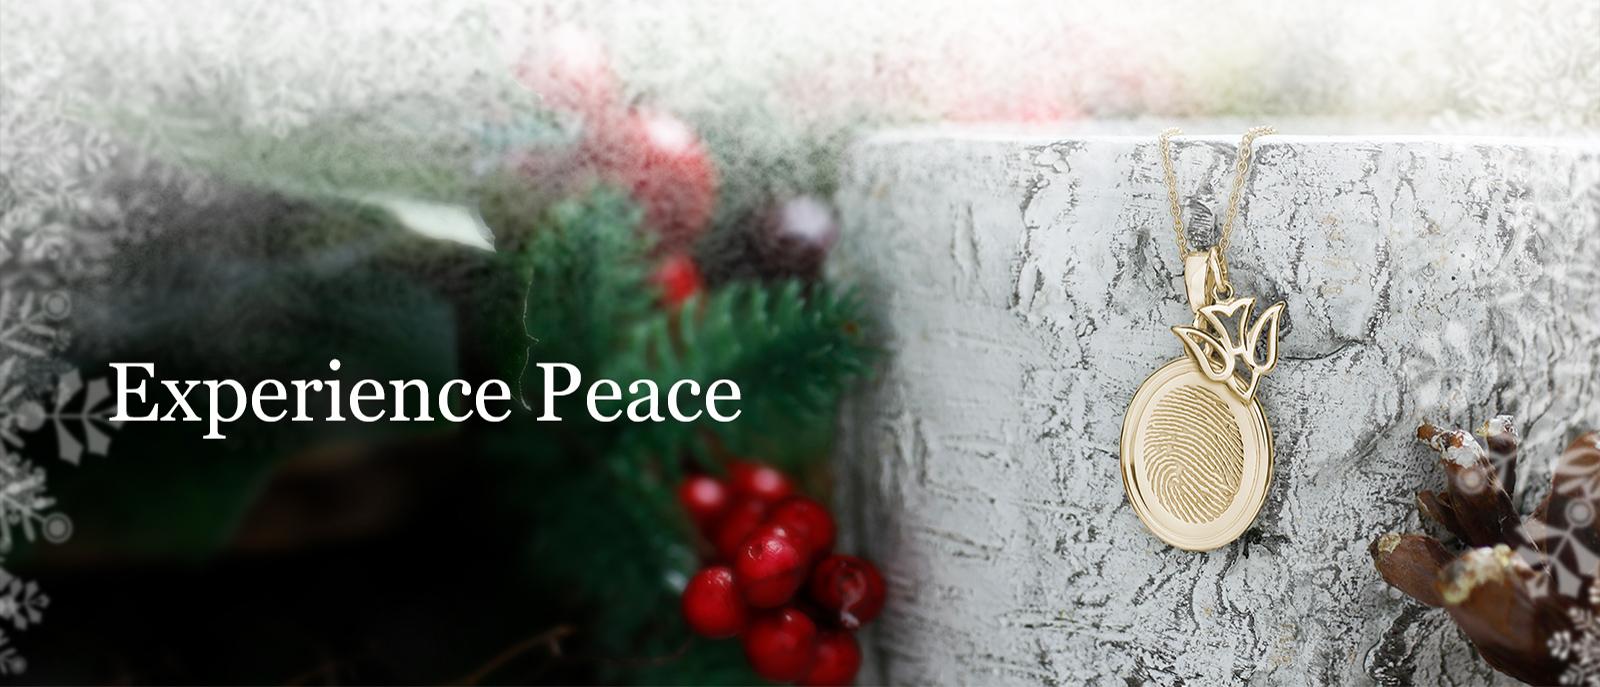 Experience Peace